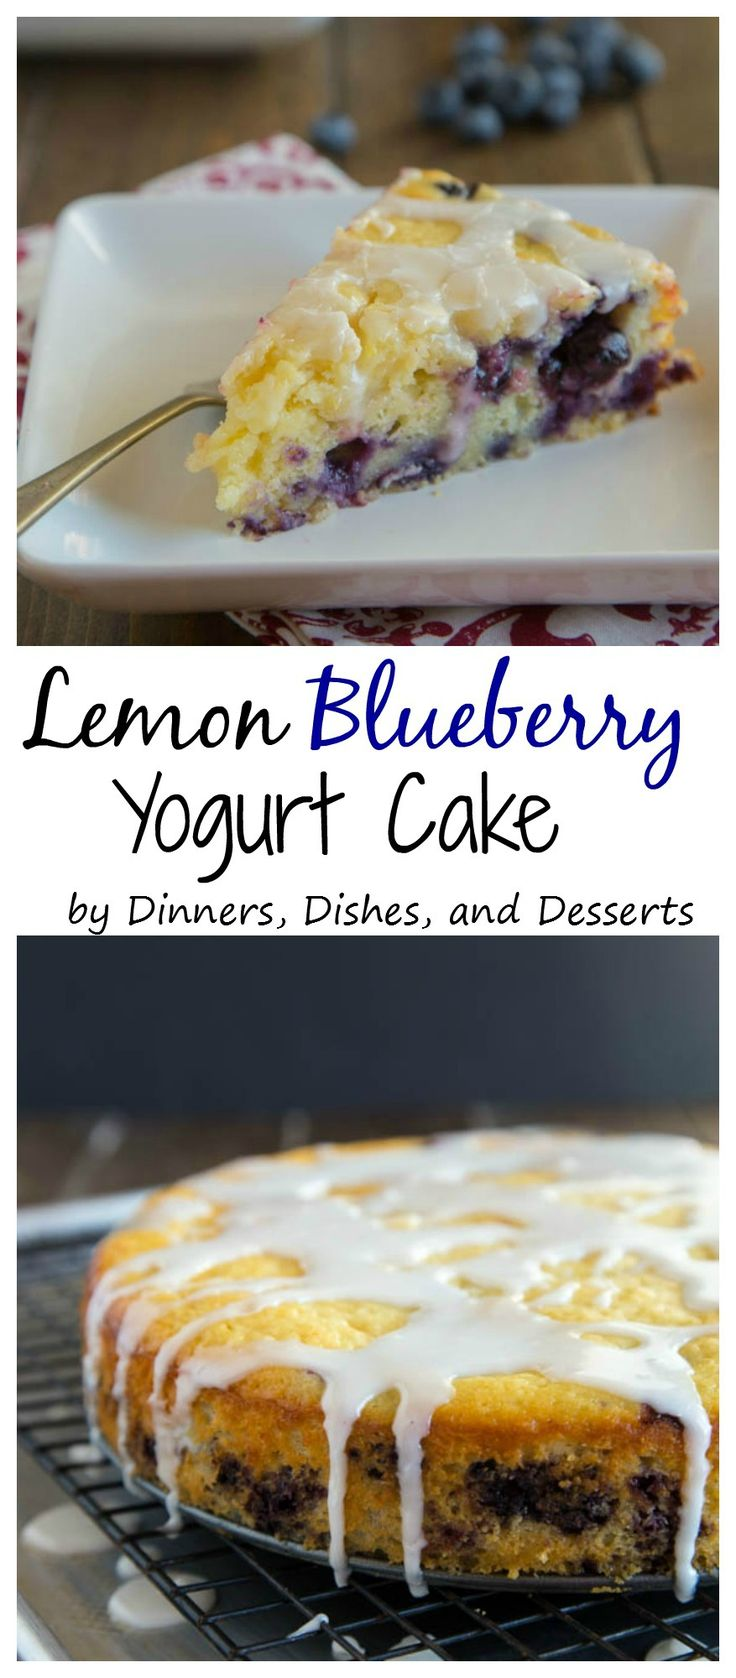 Lemon Blueberry Yogurt Cake – a super moist lemon yogurt cake studded with fresh blueberries and topped with a lemon glaze.